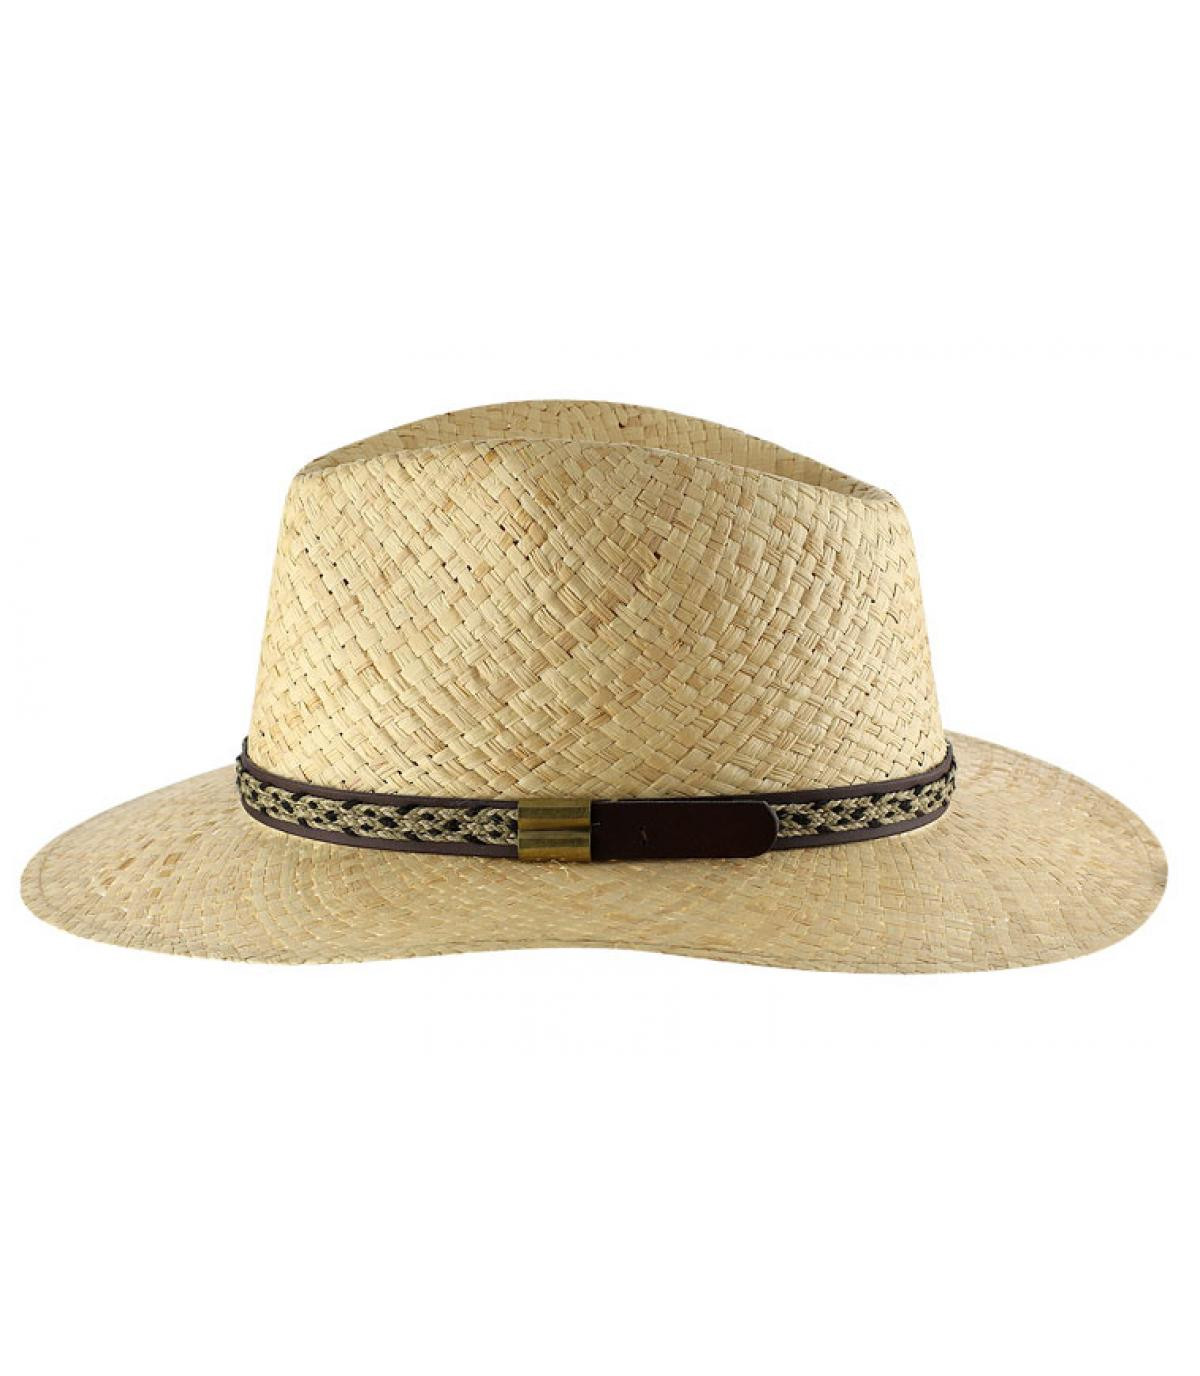 Damen Panama Hut